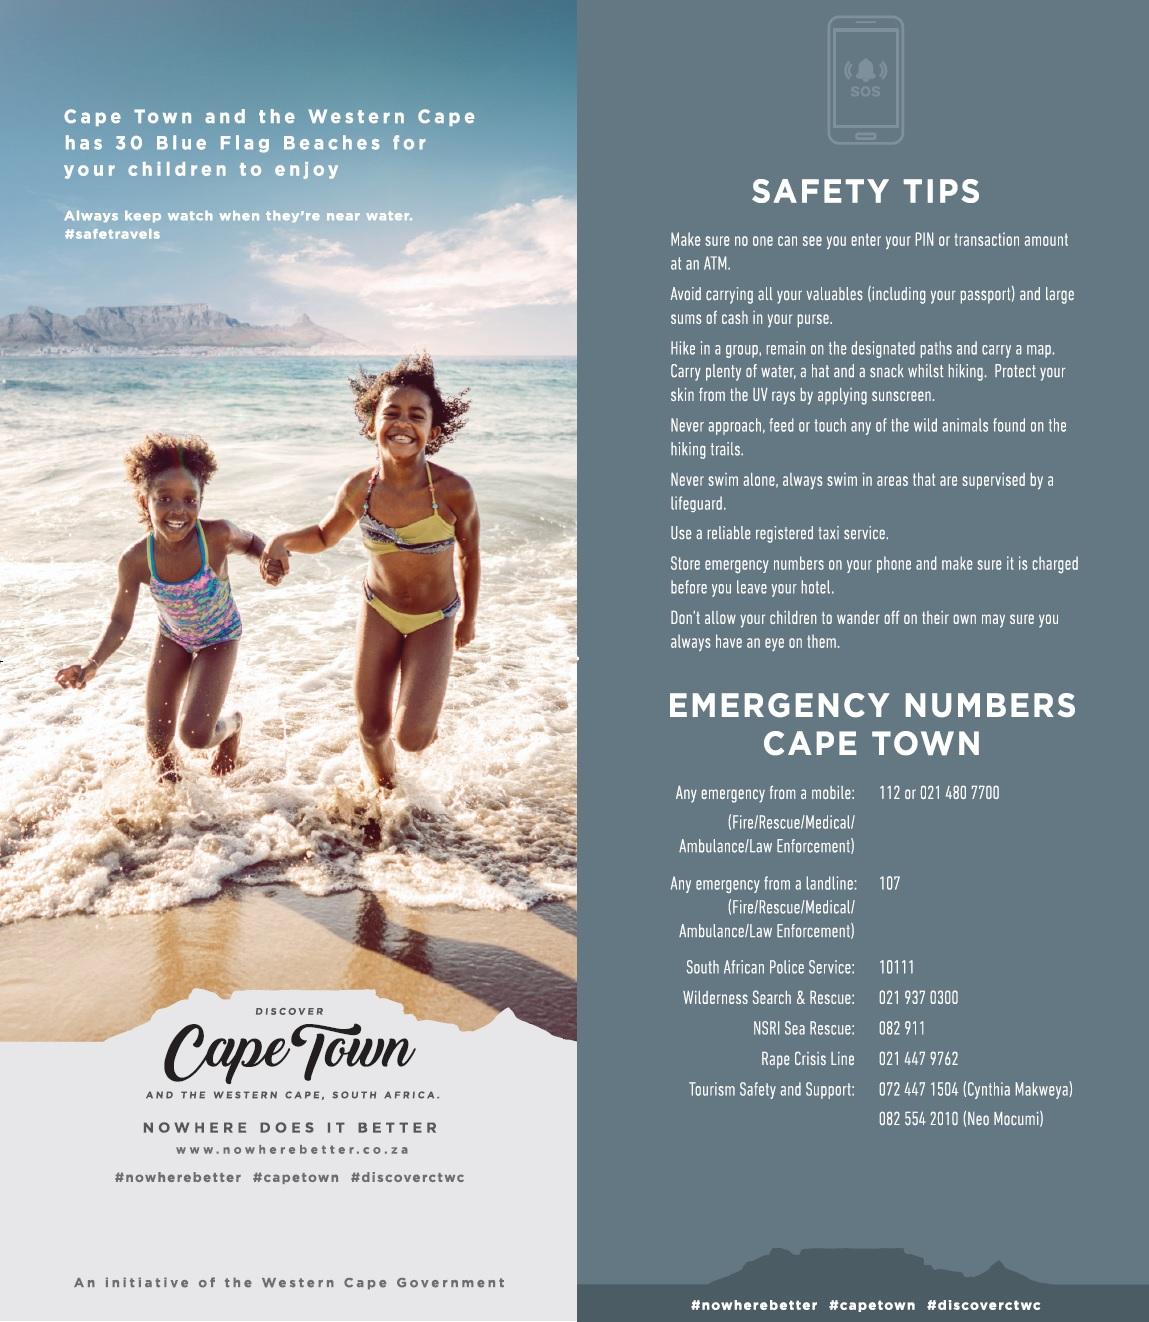 tourism_safety_tips.jpg